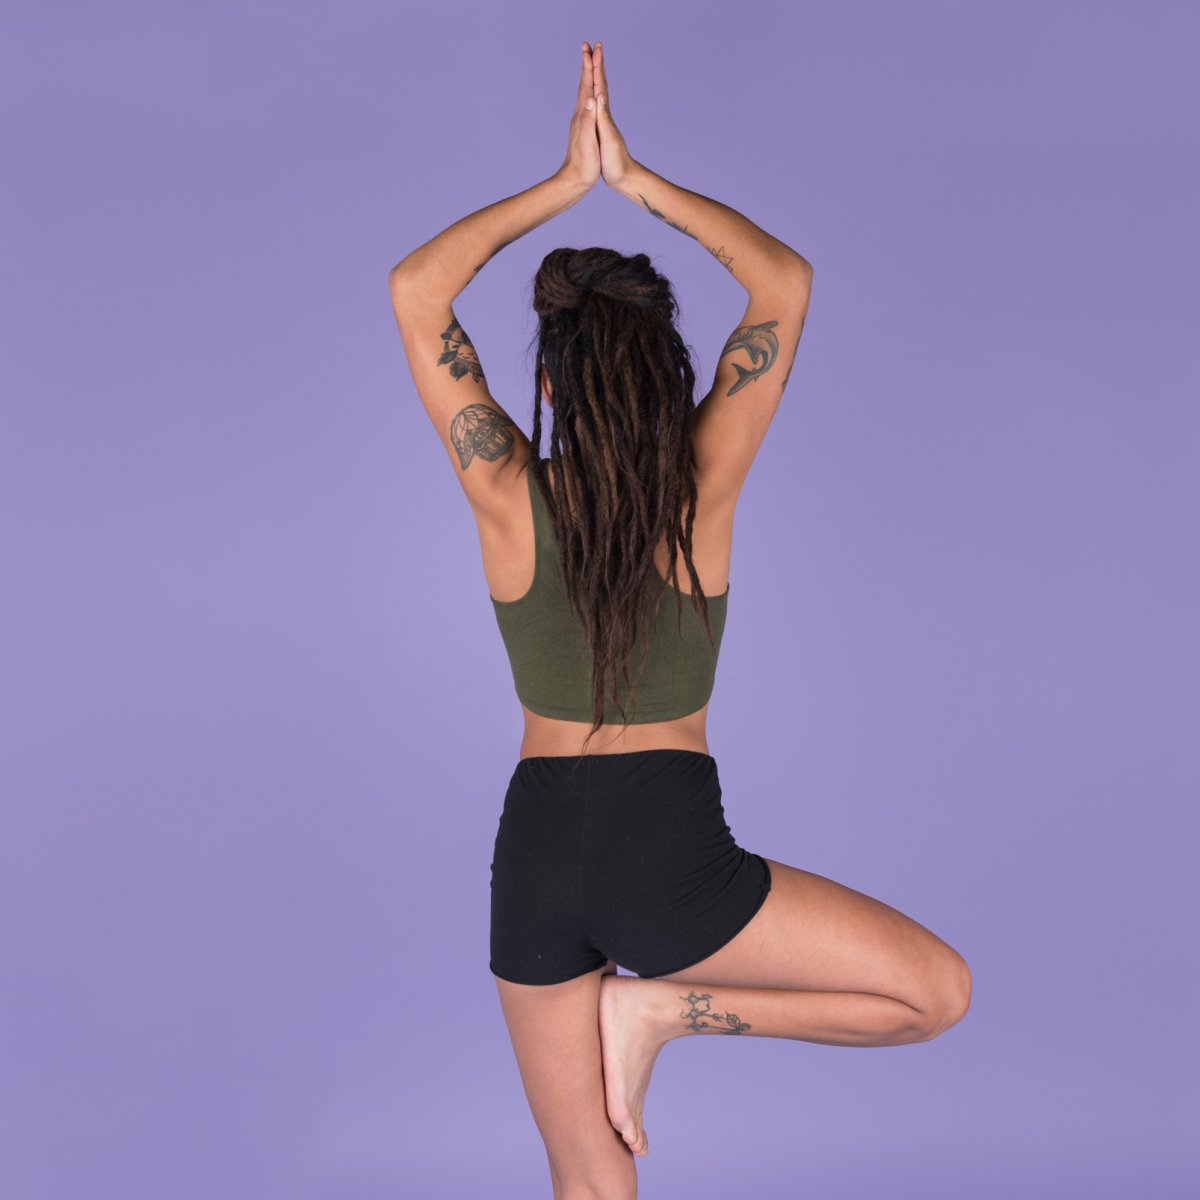 mindfulness-meditation-stress-anxiety-resilience